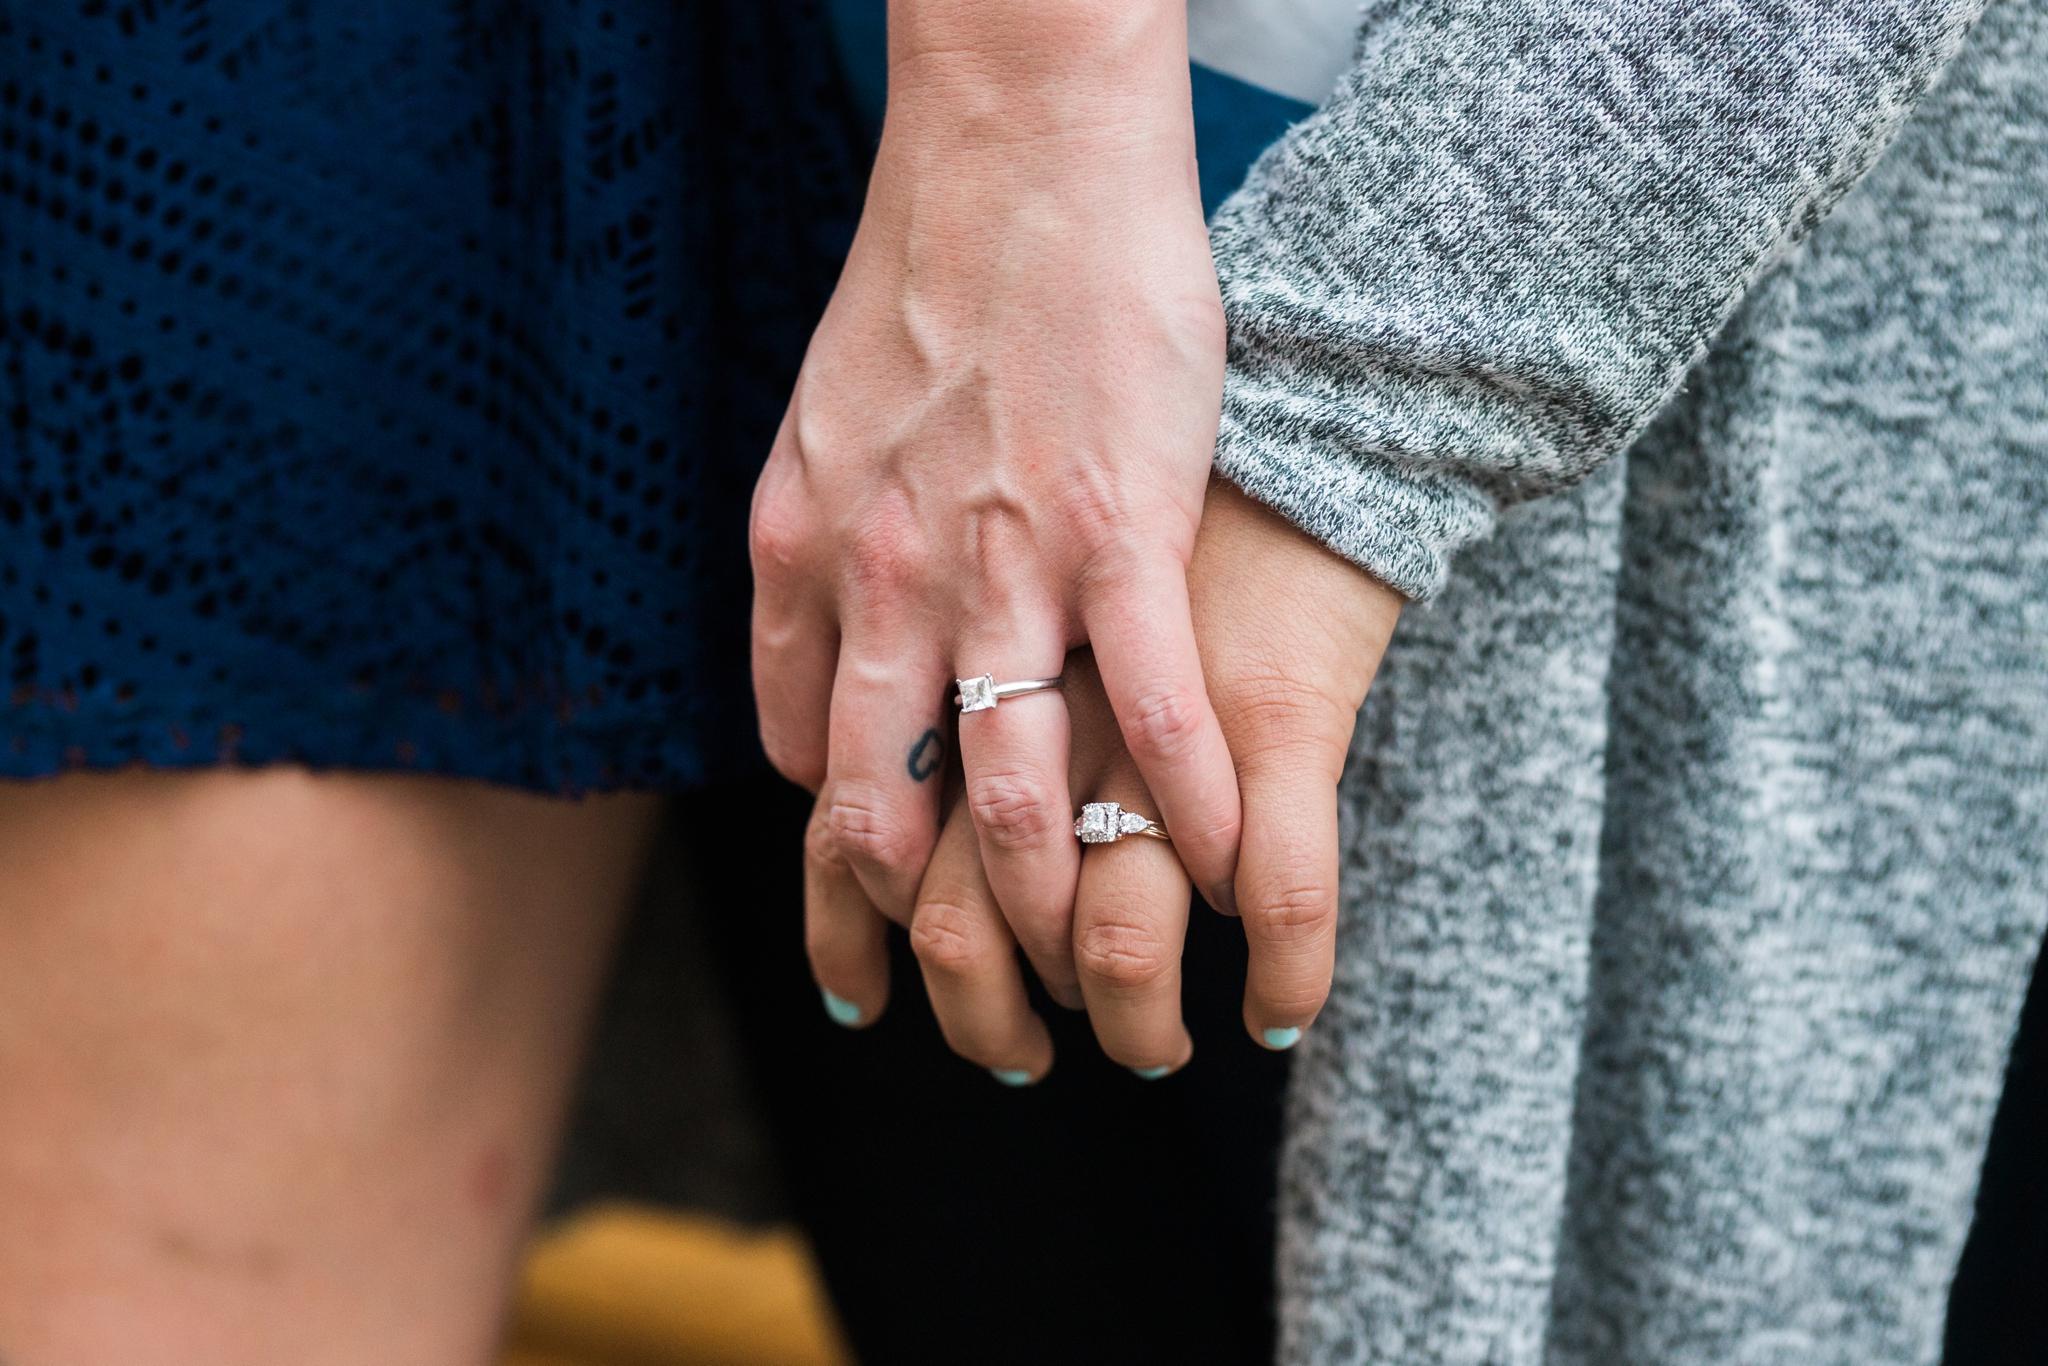 Emily Grace Photo, Lancaster, PA Same-Sex Wedding Photographer, Tellus360 Same-Sex Lesbian Engagement, Photo Session with Dogs